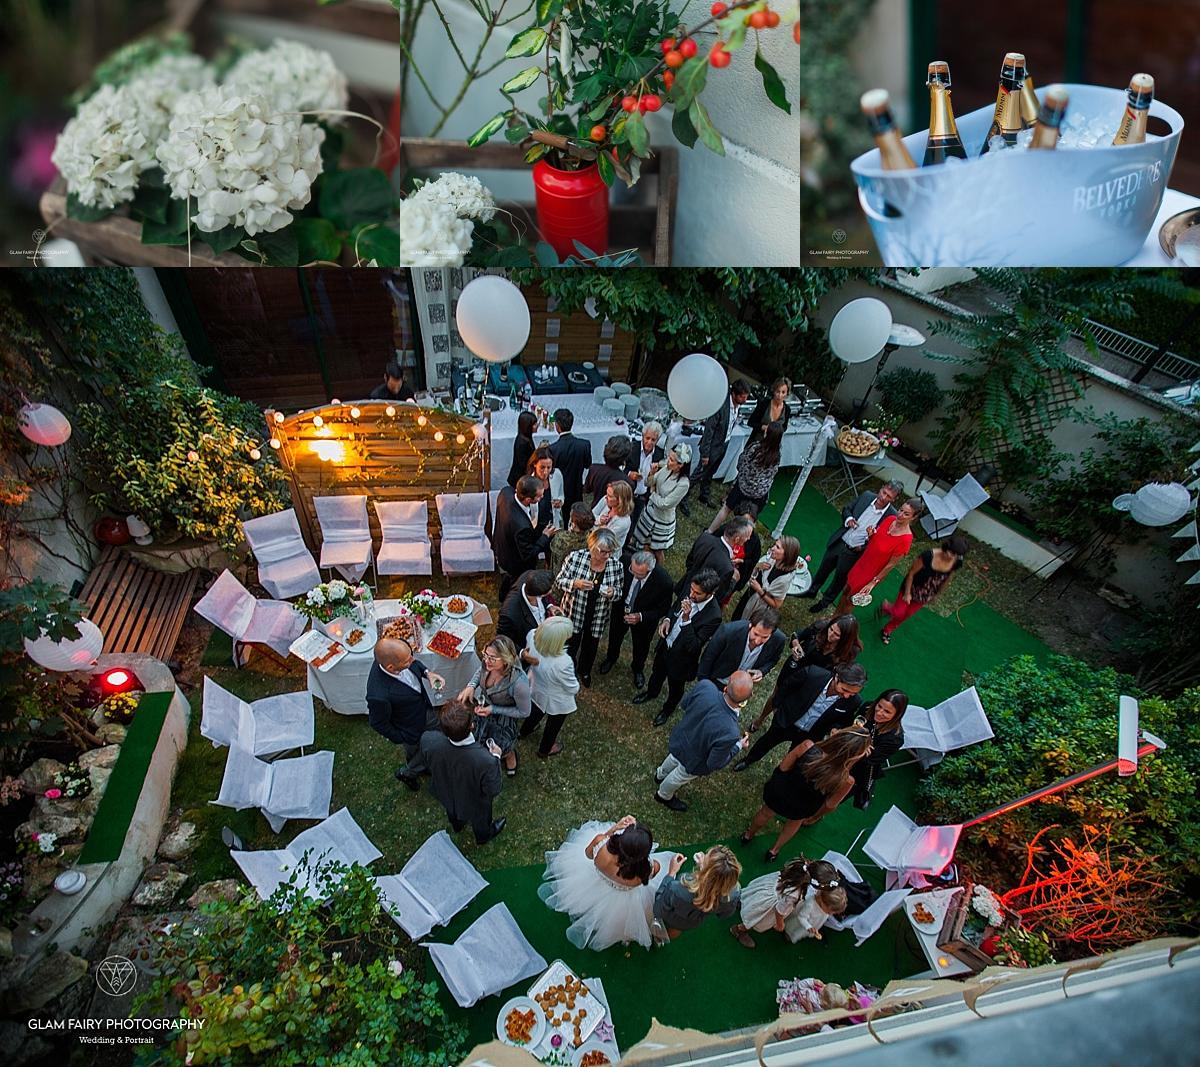 GlamFairyPhotography-mariage-civil-boulogne-billancourt-sabrina_0014